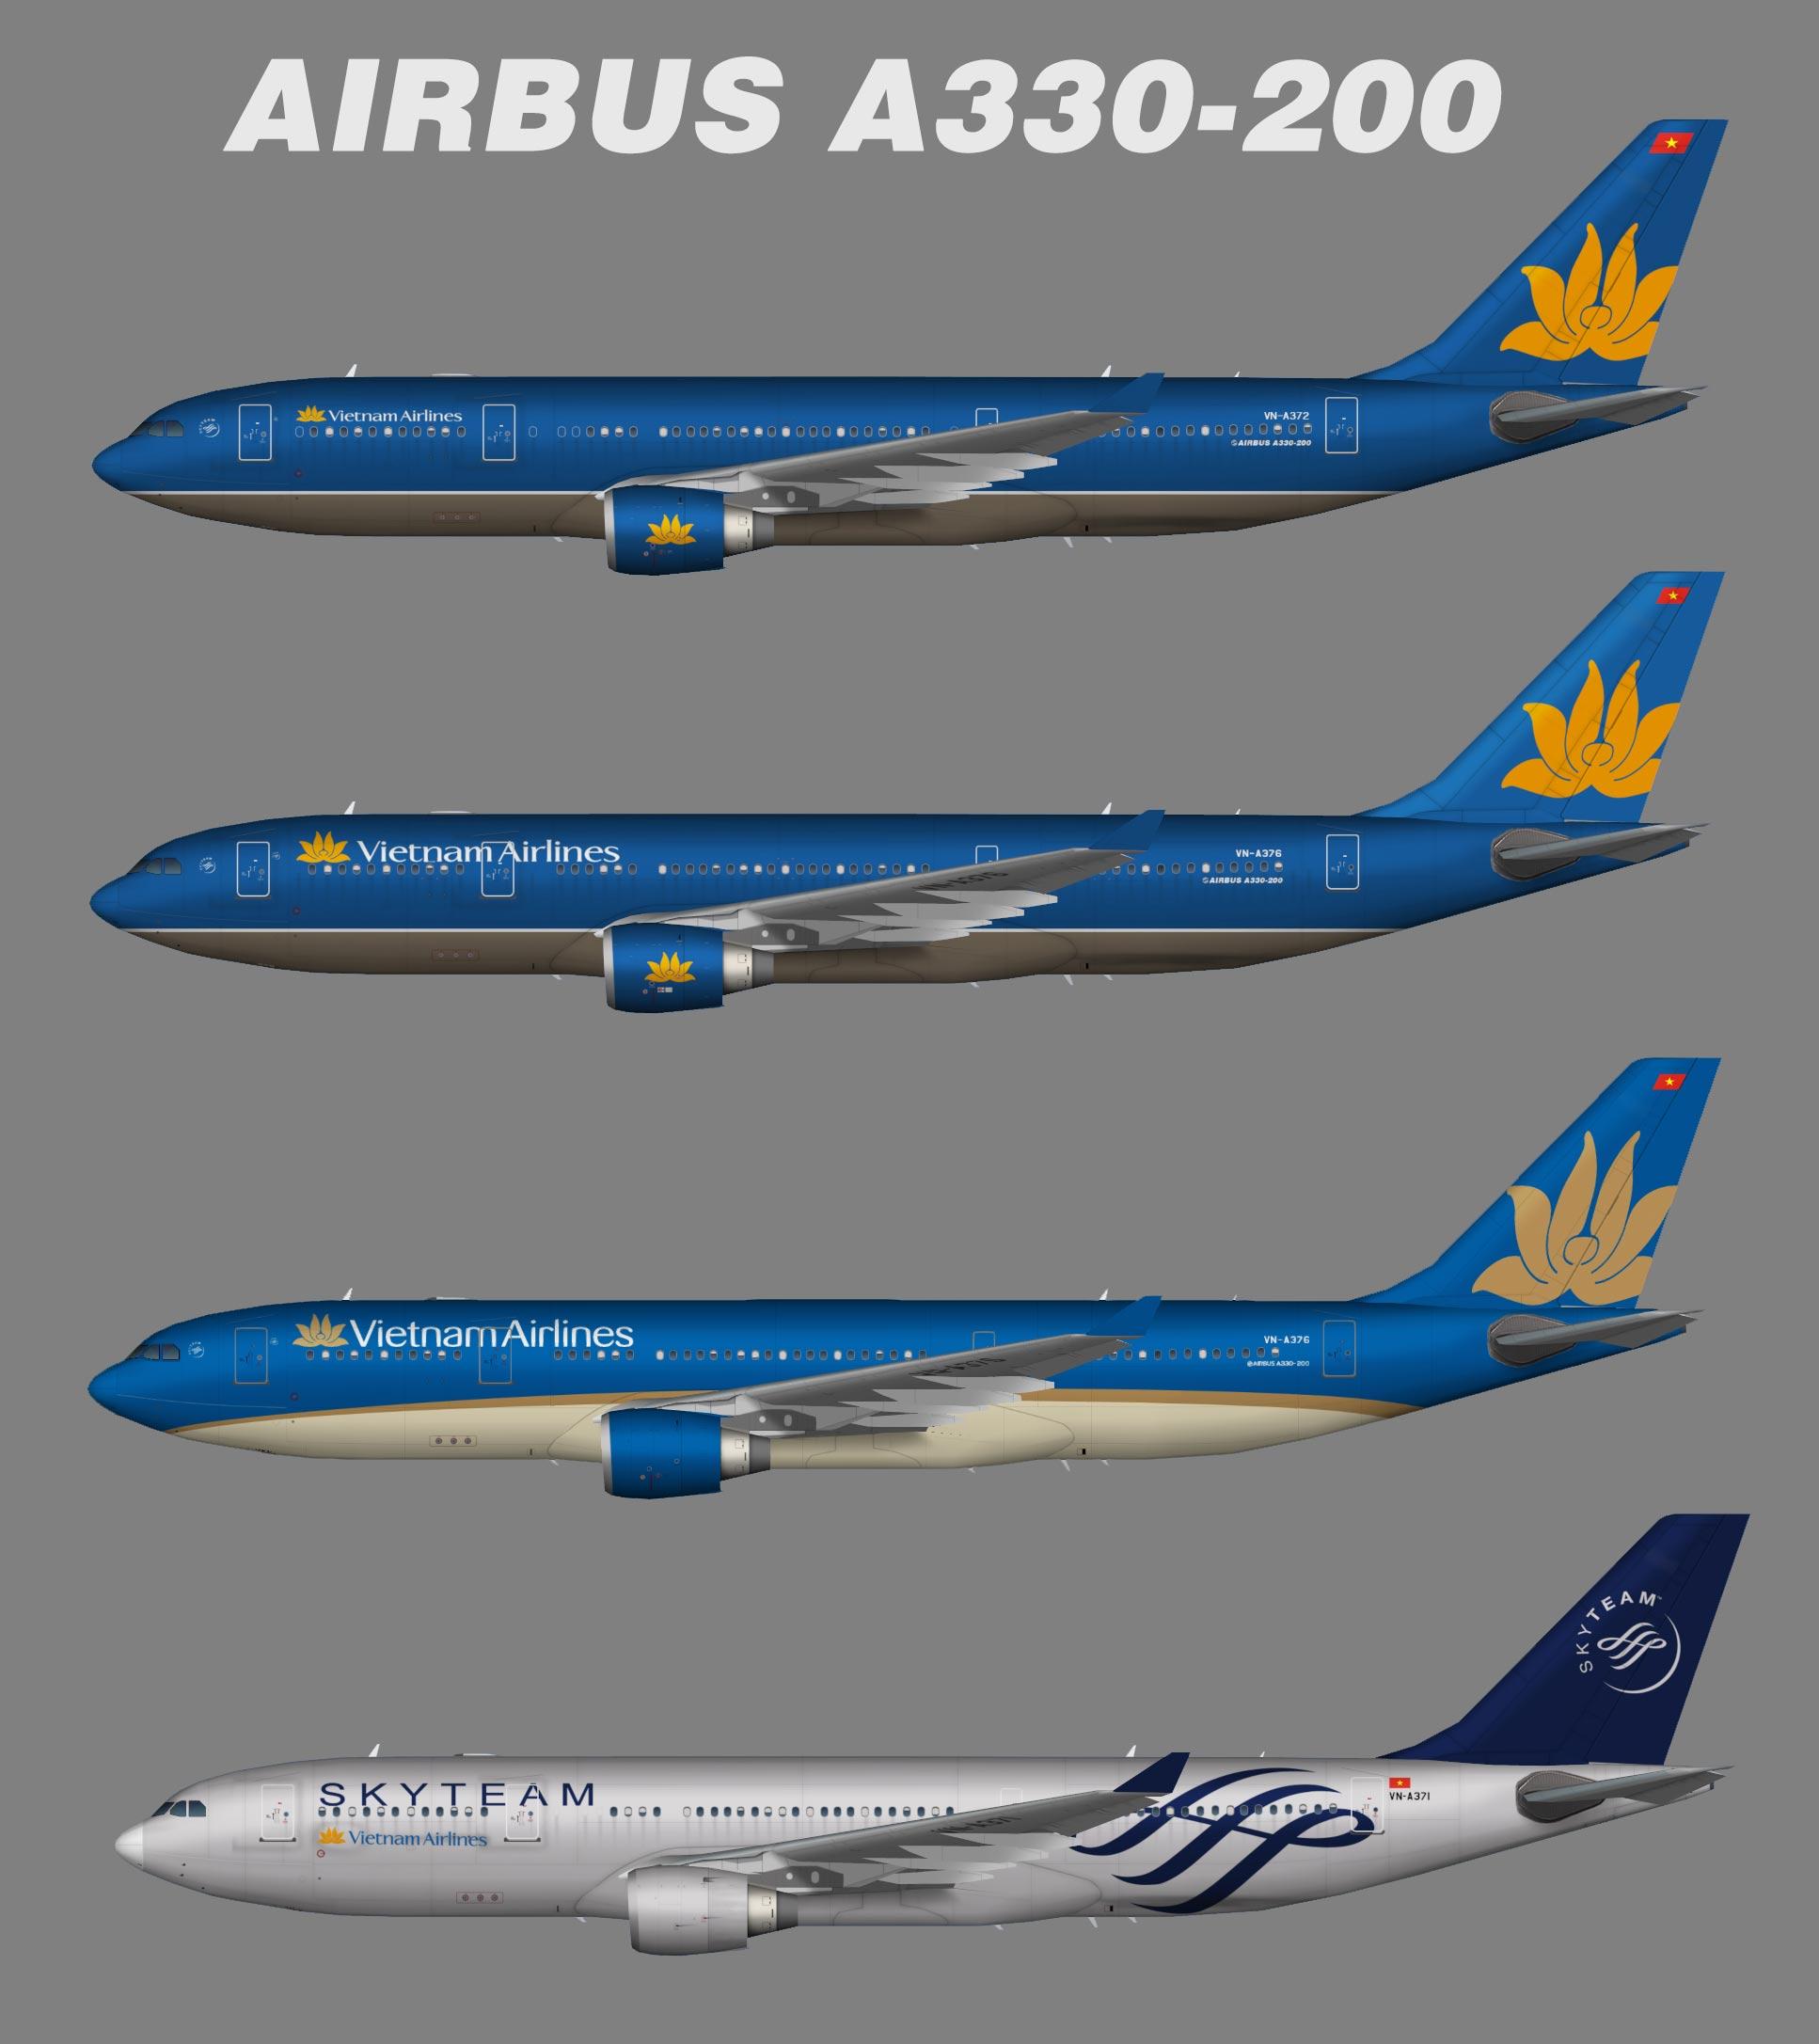 Vietnam Airlines Airbus A330-200